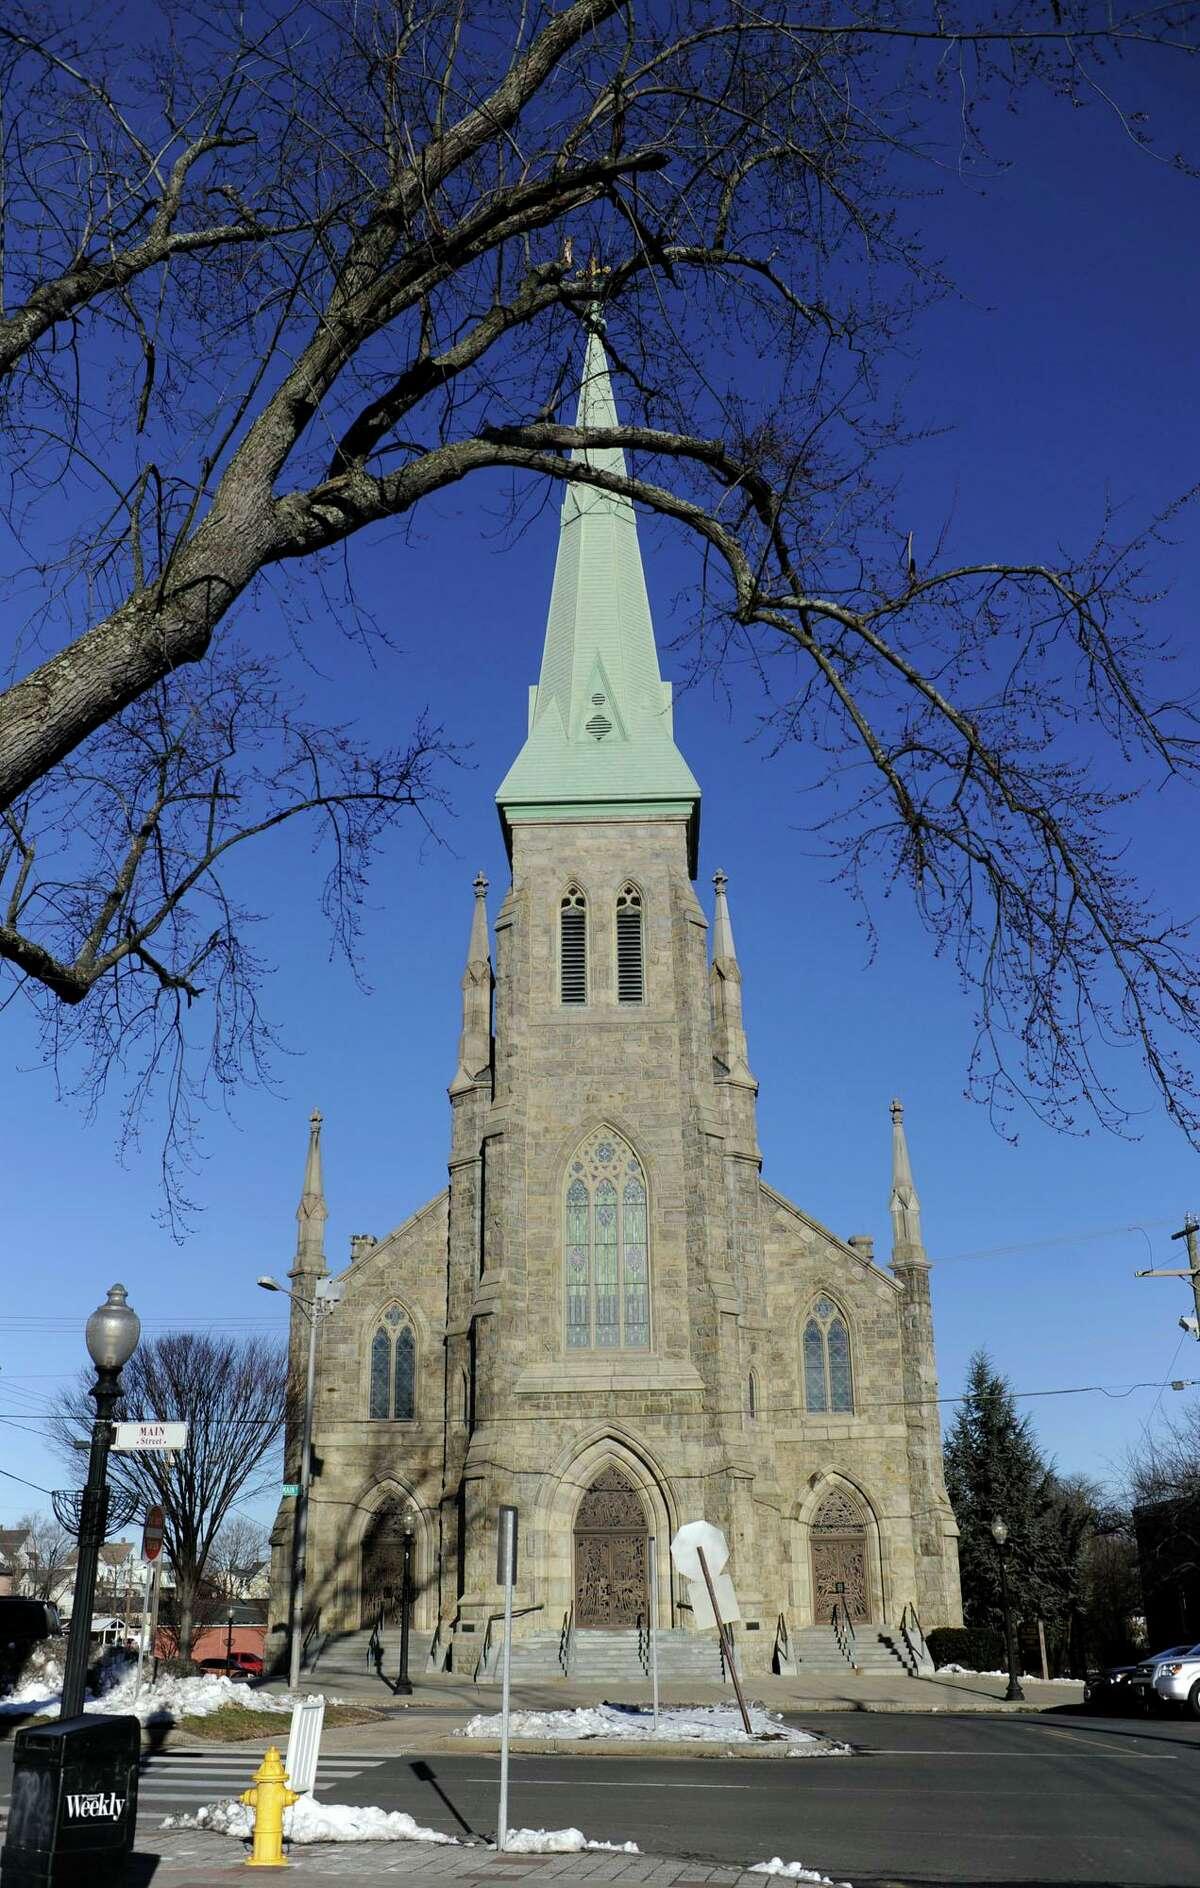 St. Peter Roman Catholic Church on Main Street, Danbury, Conn., Friday, January 18, 2013.